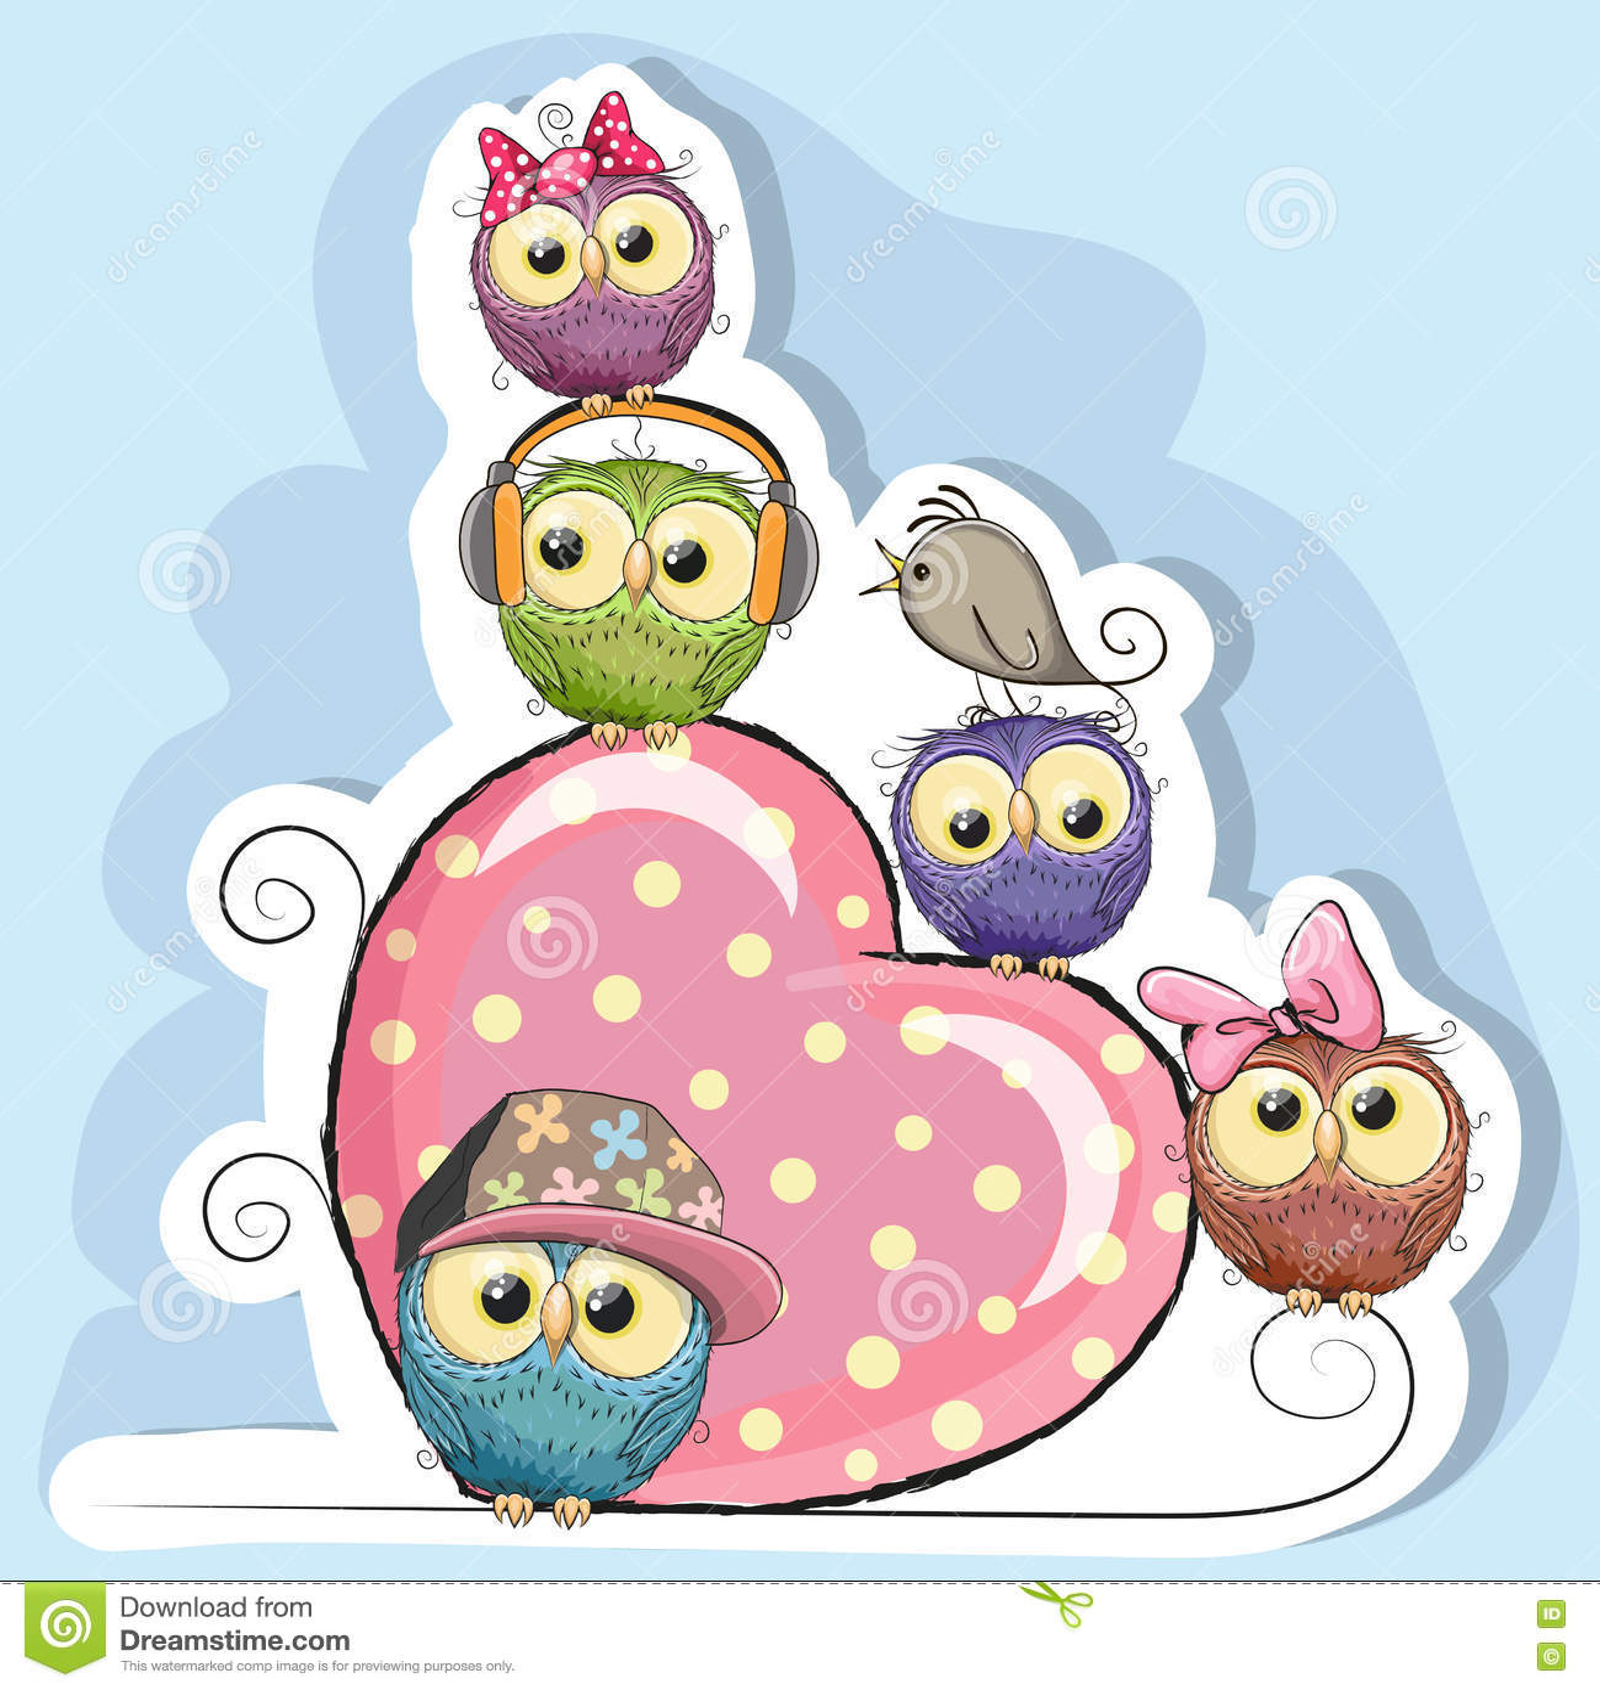 Cinco búhos se están sentando en un corazón